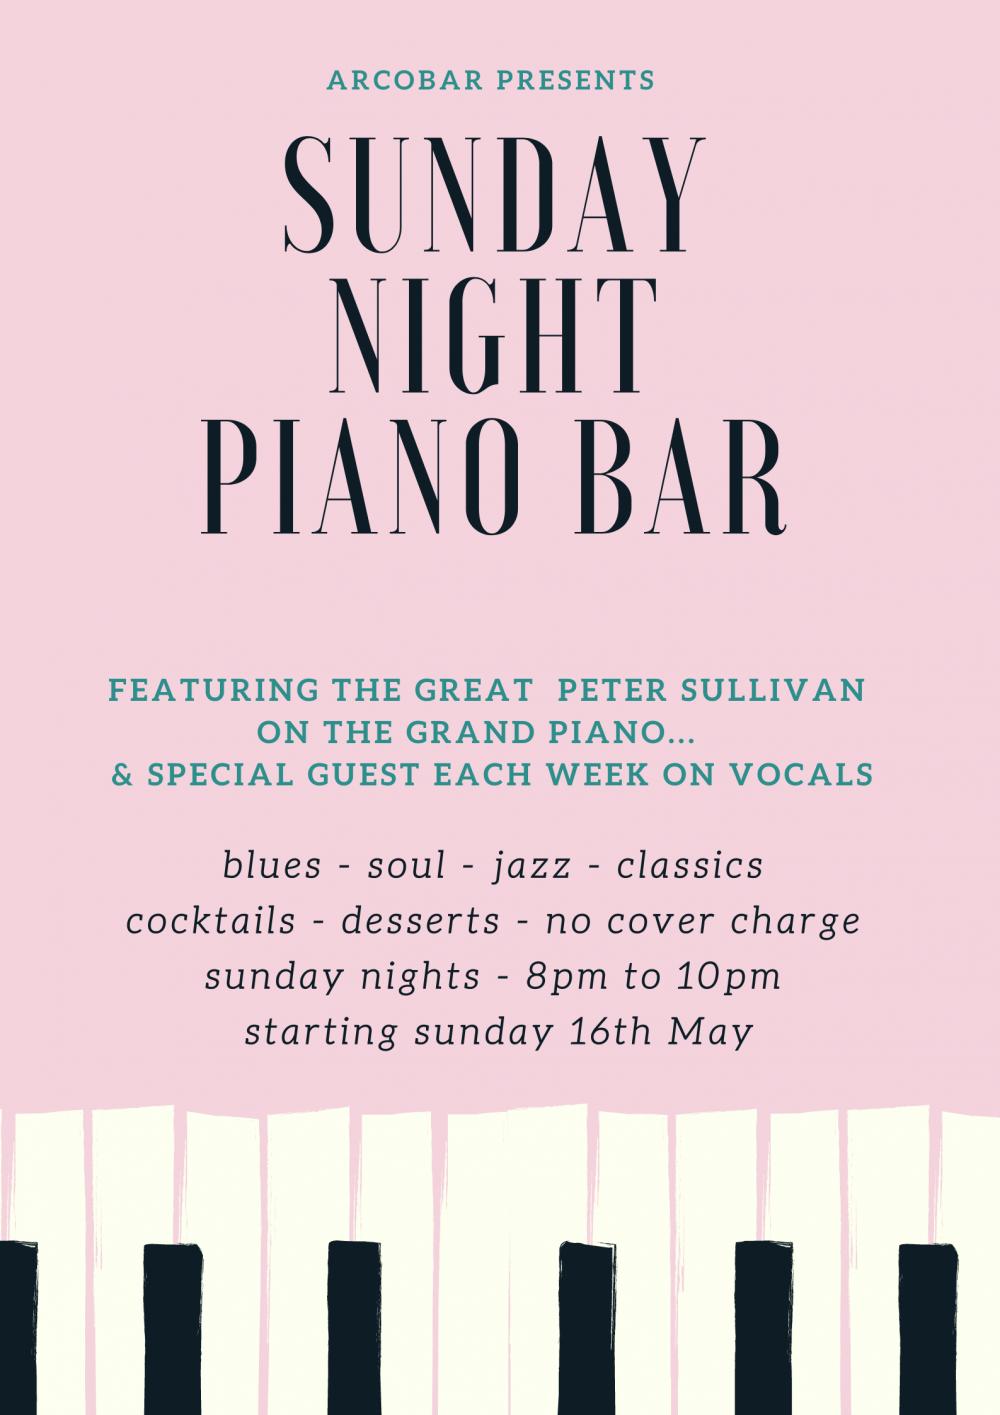 SUNDAY NIGHT PIANO BAR - Every Sunday Night From 16th May to Sunday 26th September